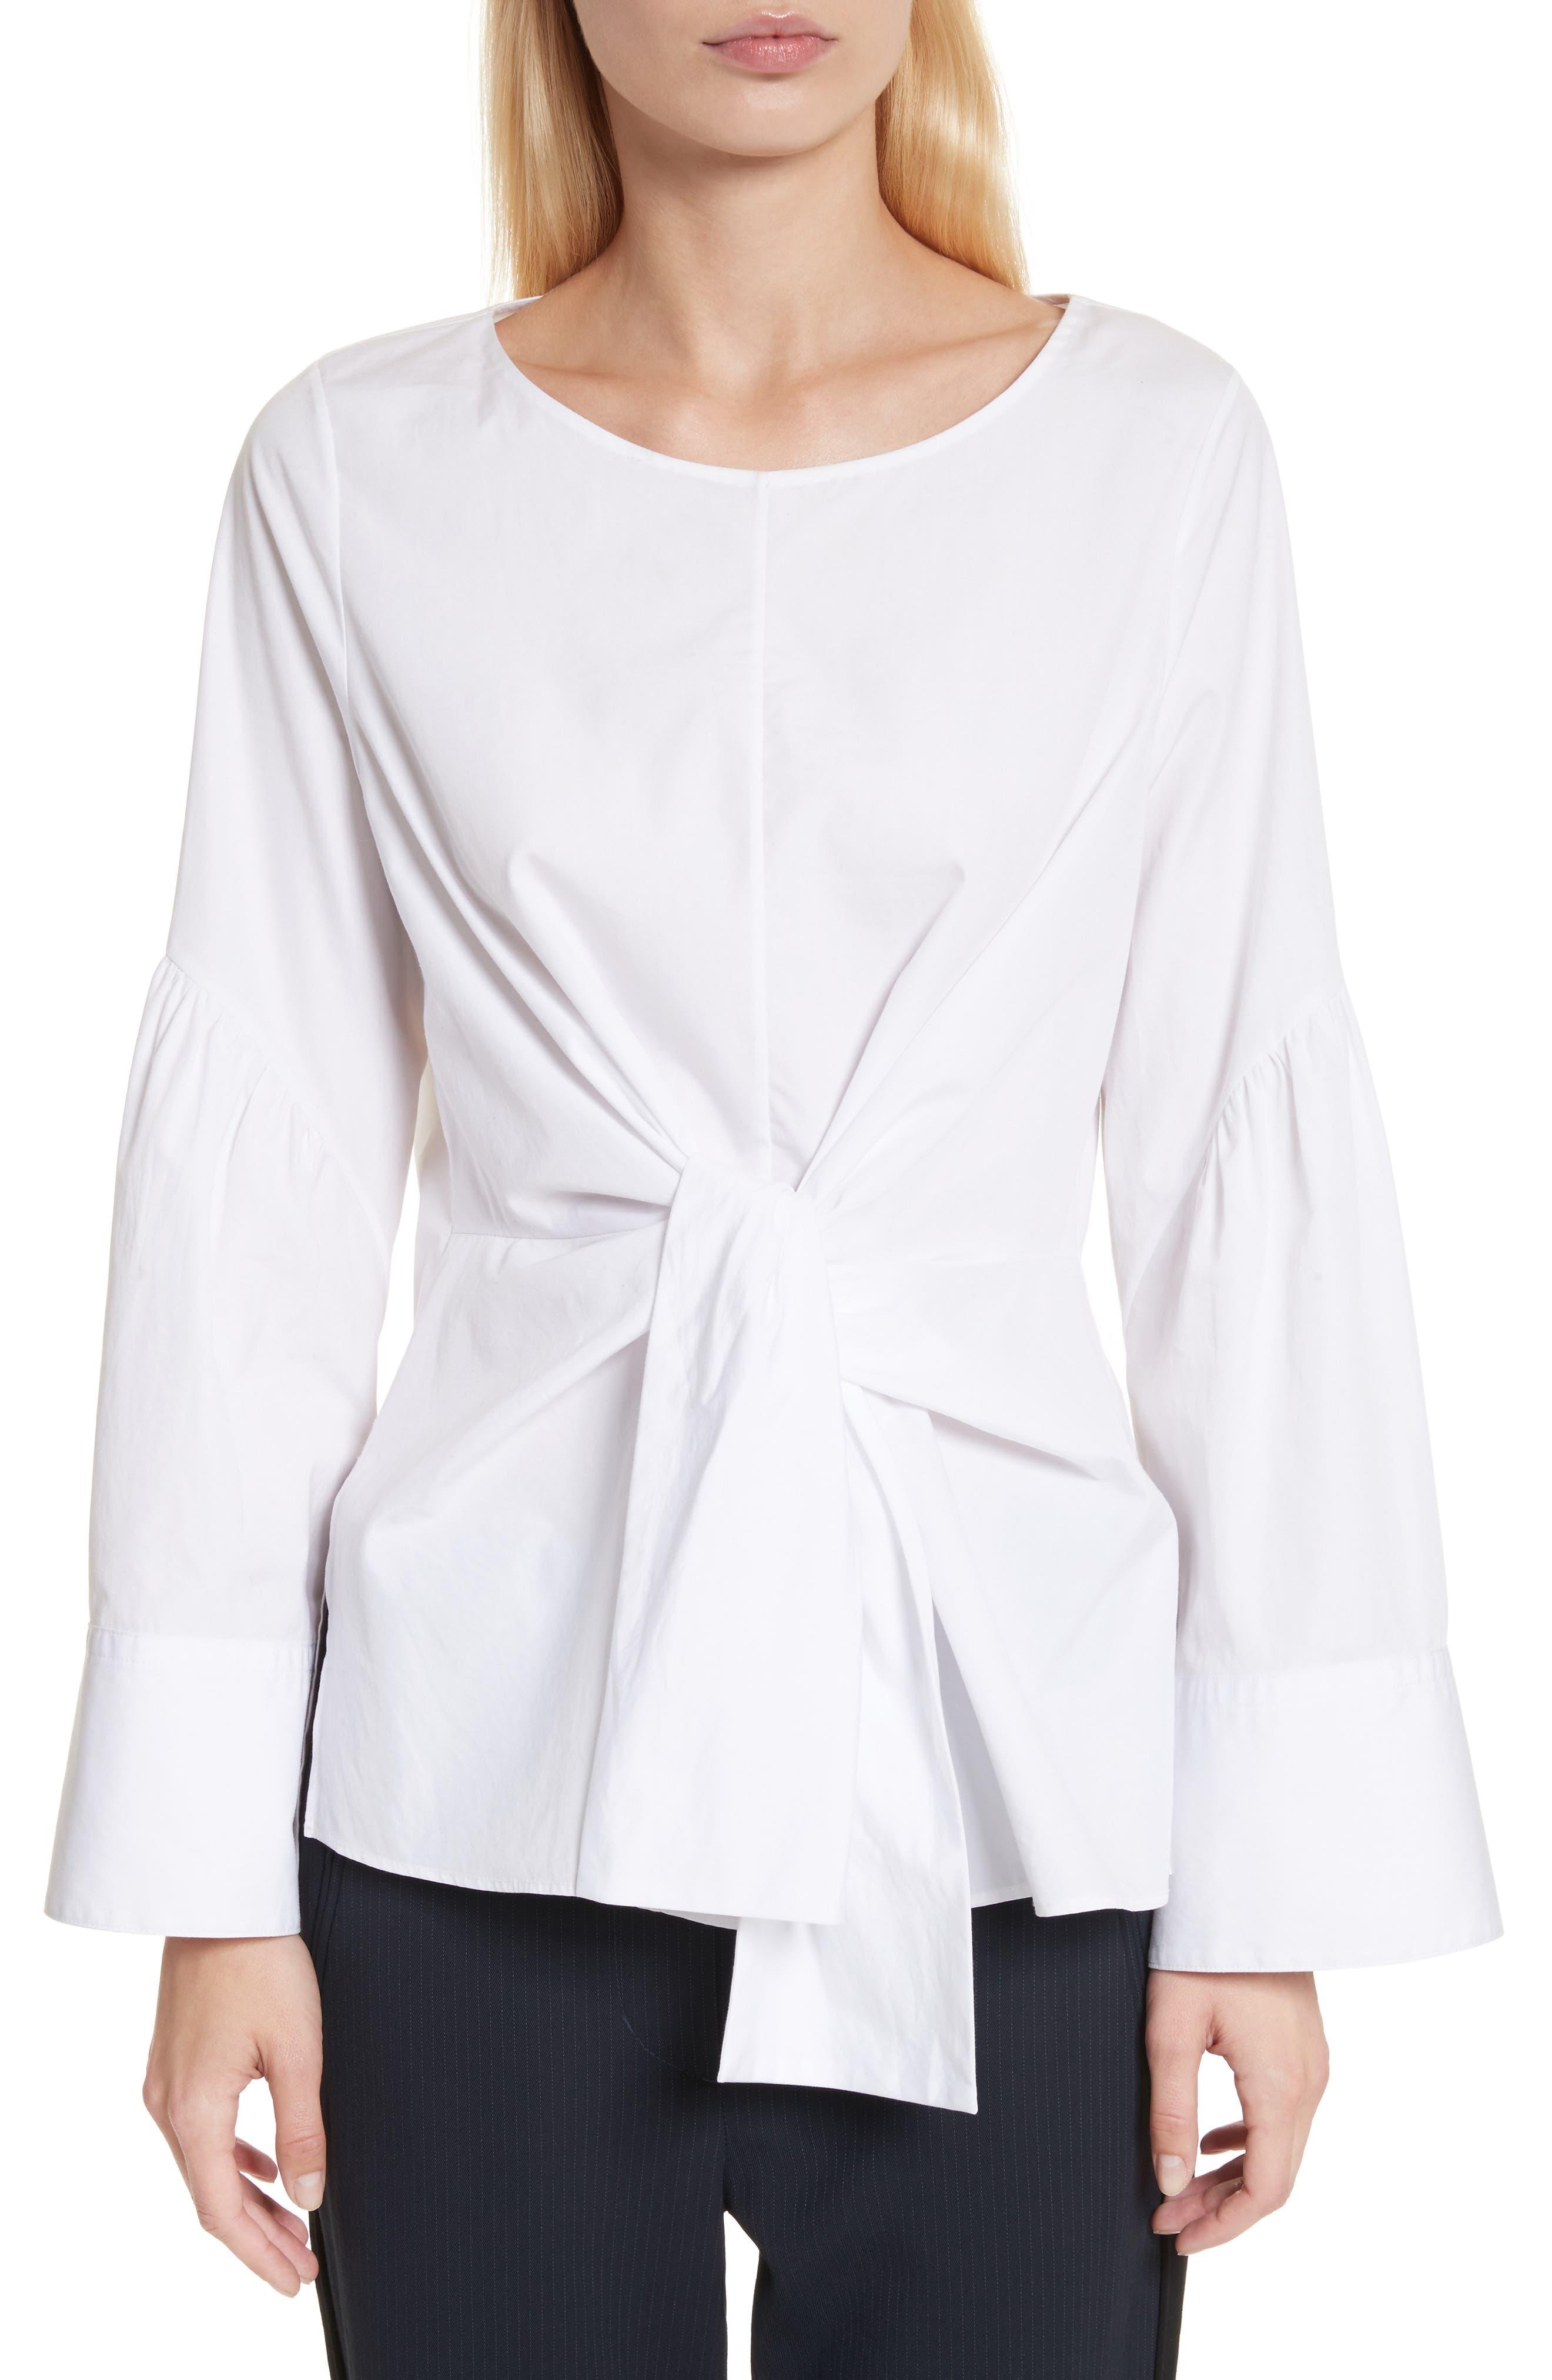 Main Image - 3.1 Phillip Lim Tie Front Shirt